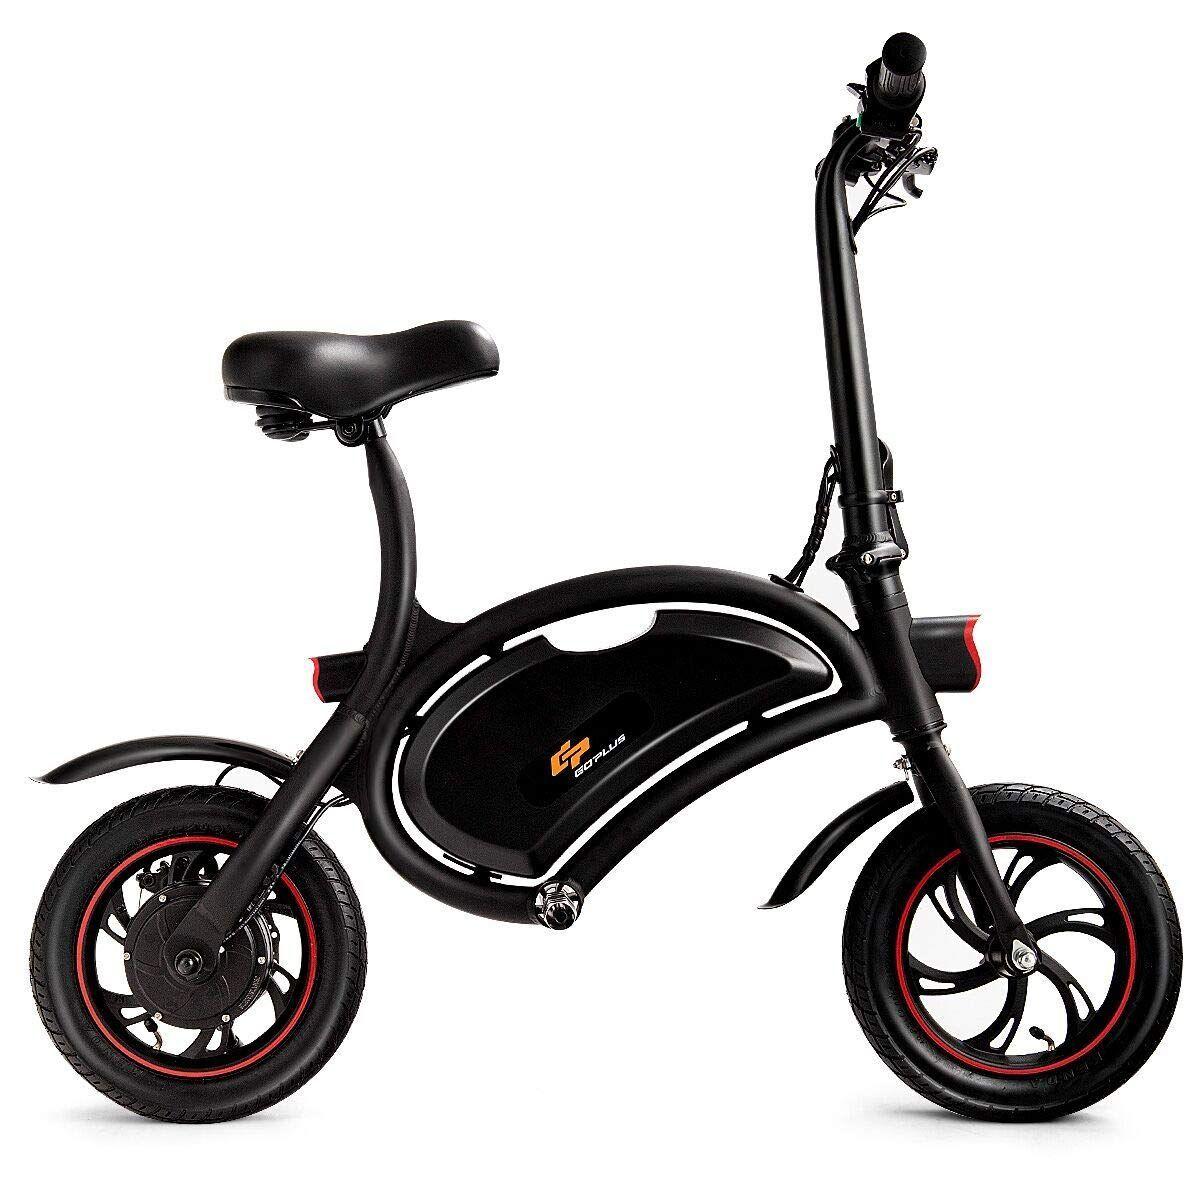 Goplus Foldable Electric Bike 350W